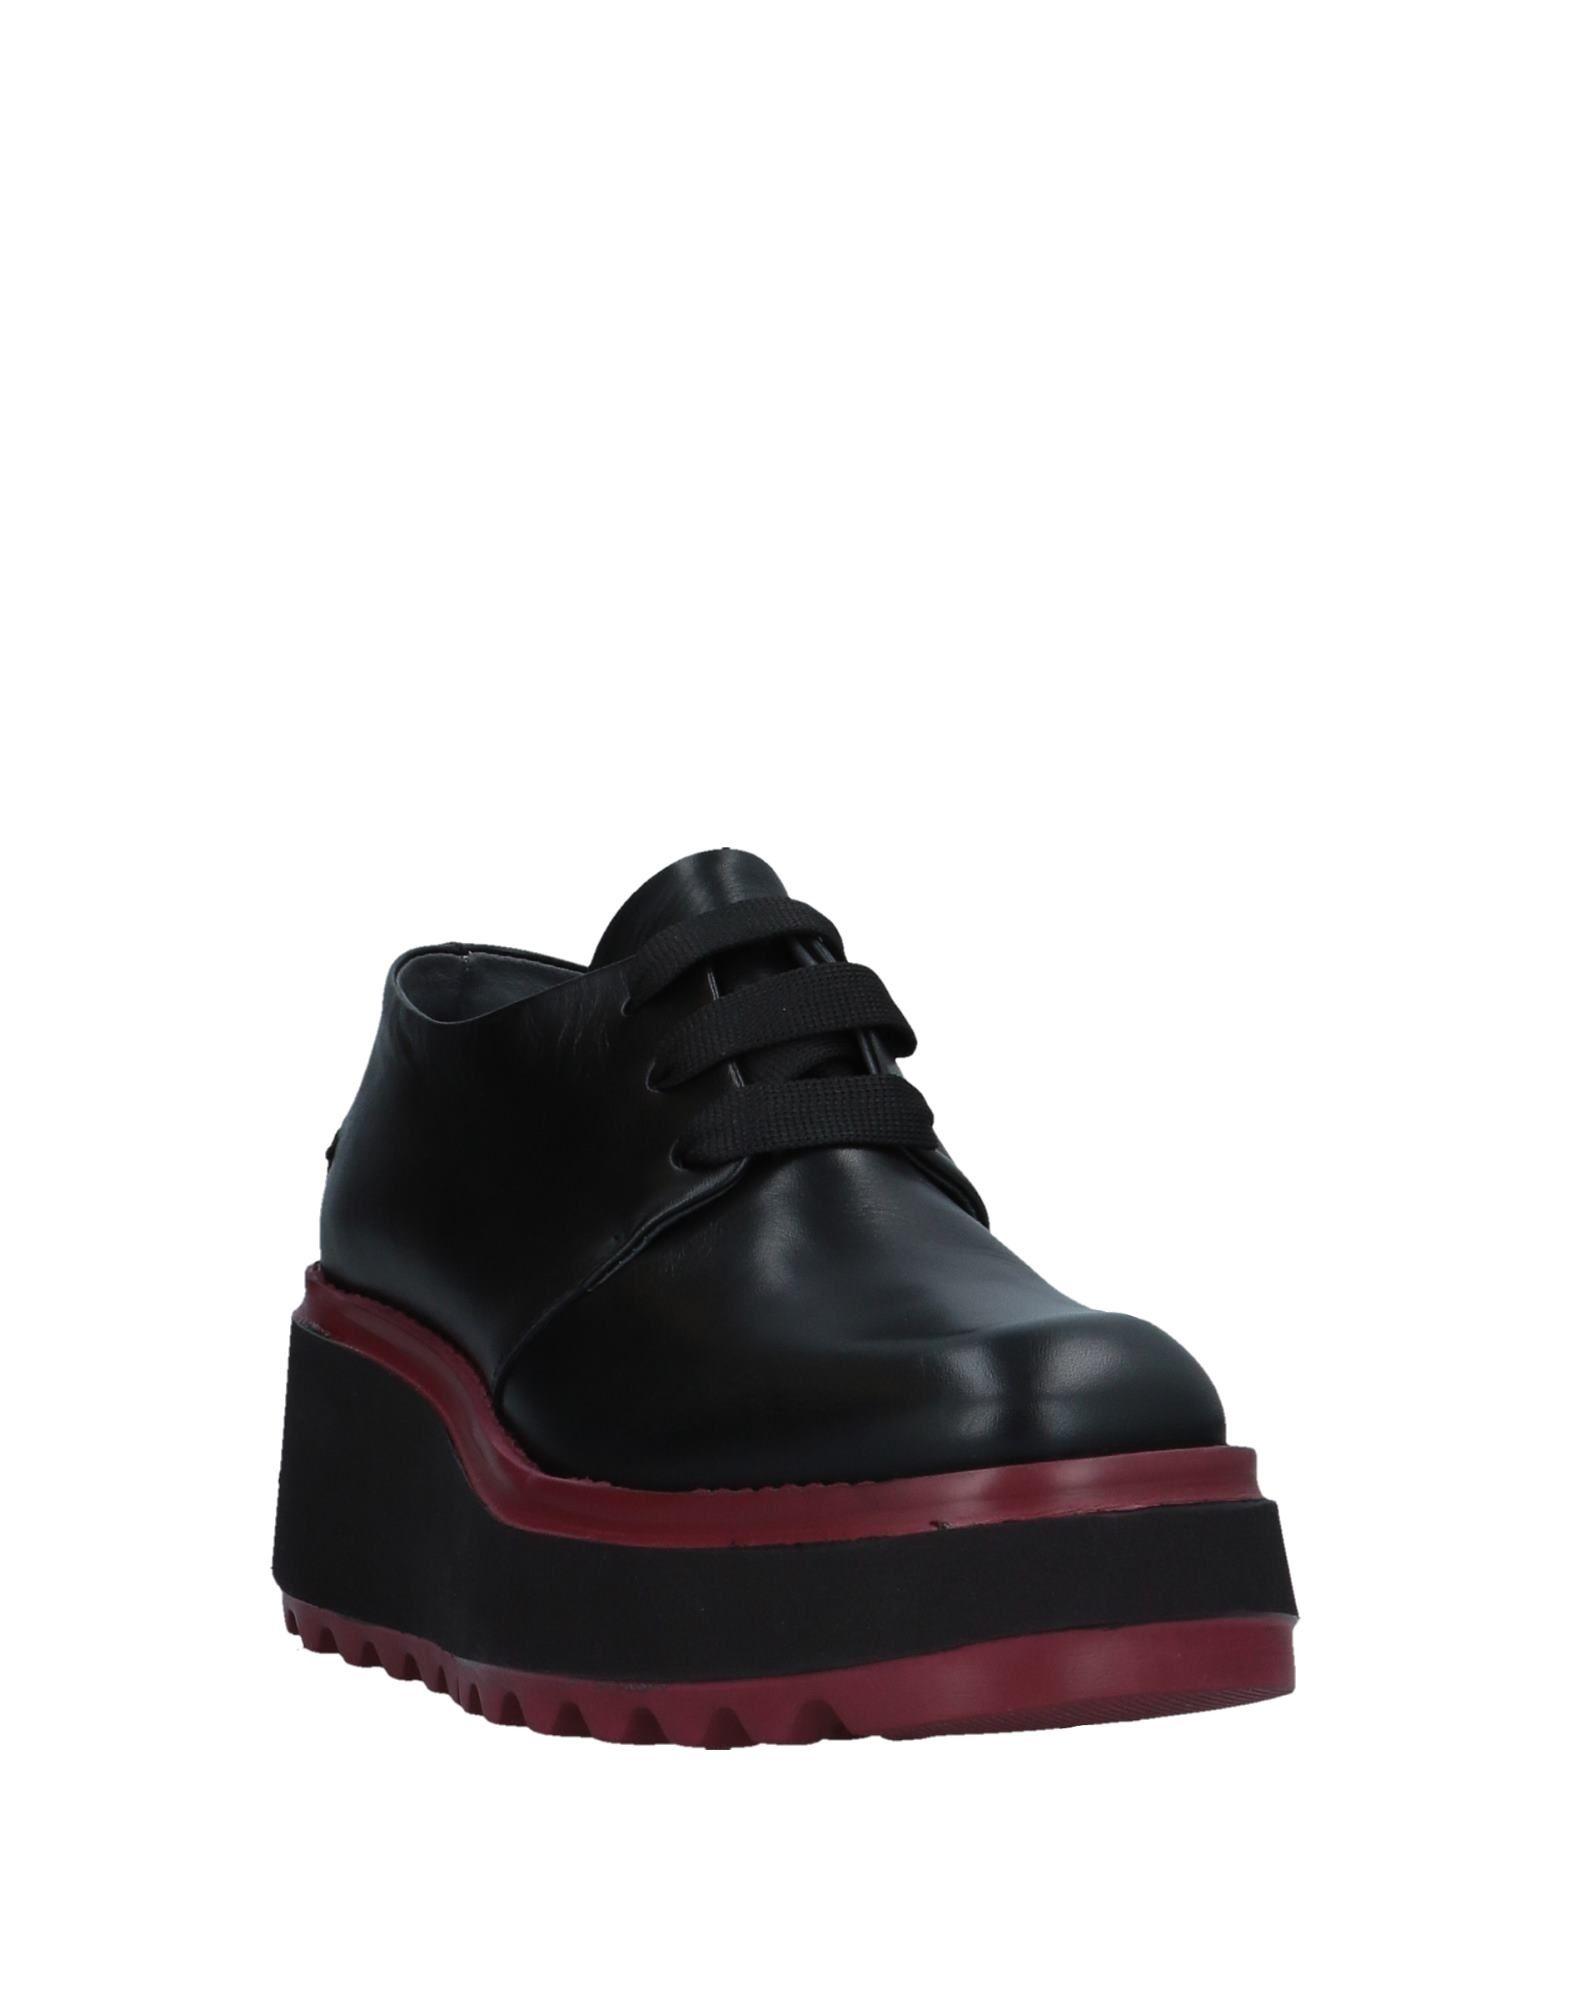 Patrizia Bonfanti Schnürschuhe Damen  11532254TU Gute Qualität beliebte Schuhe